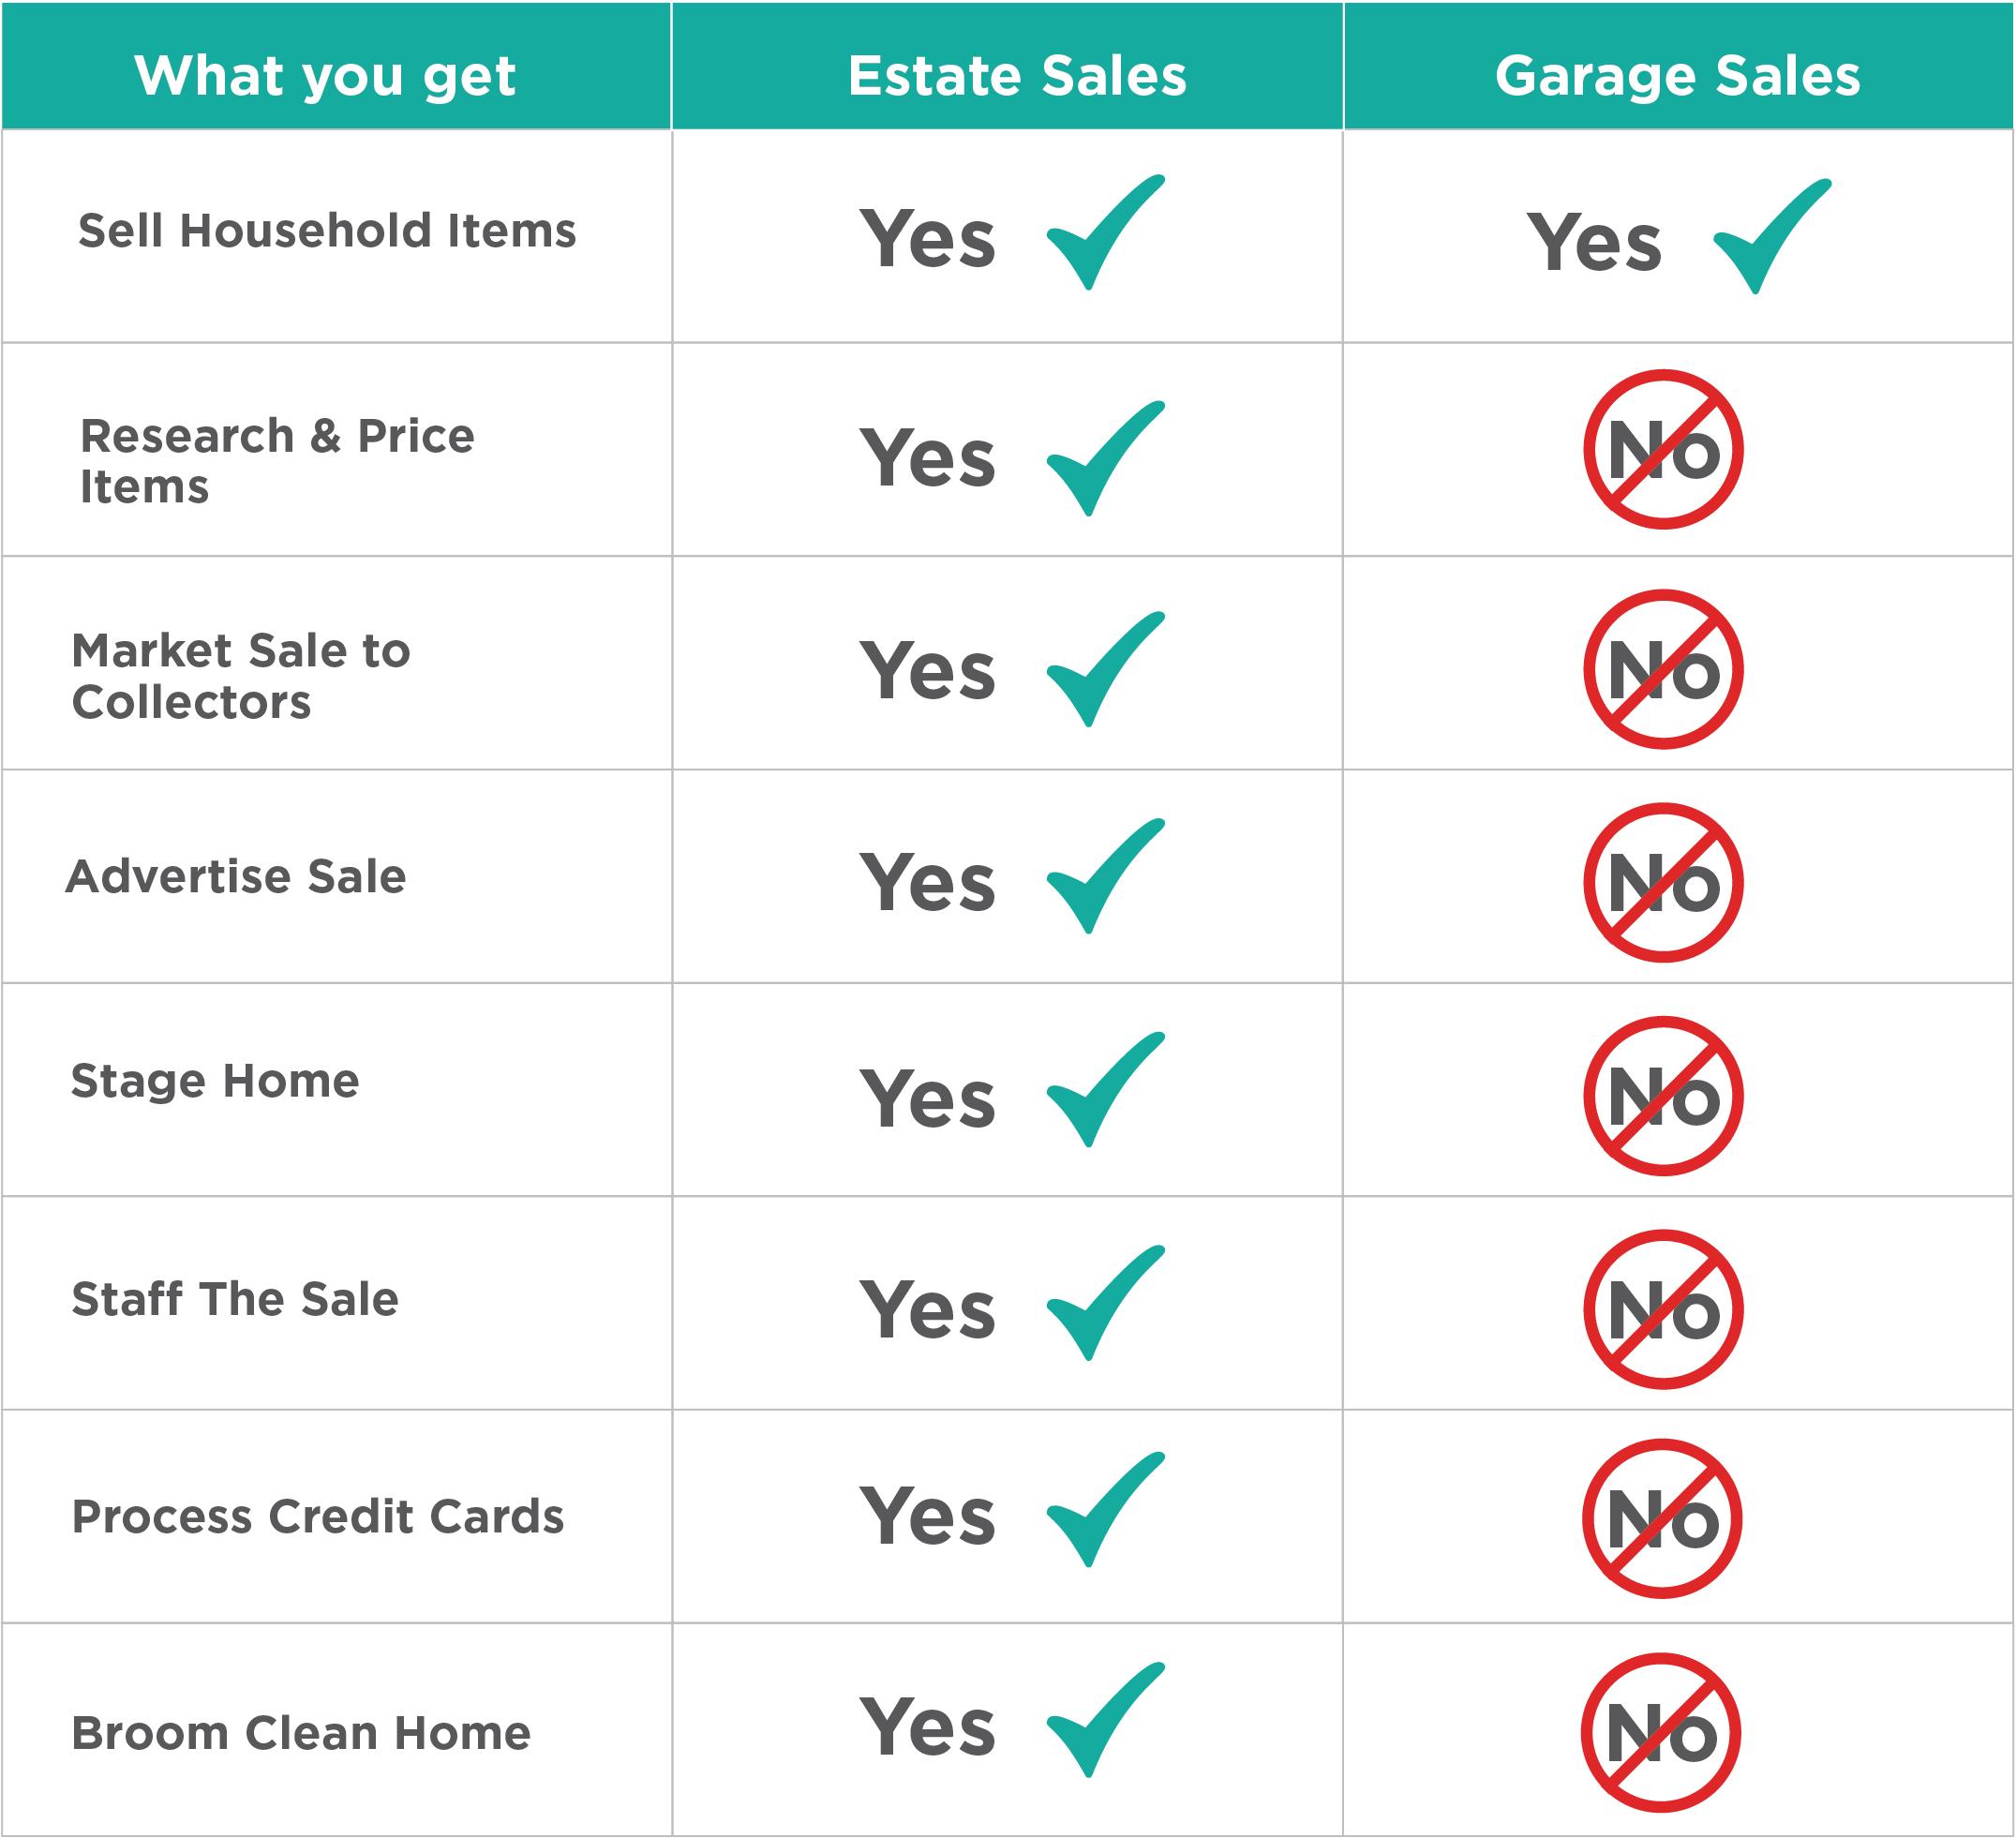 Estate Sale Vs Garage Sale.jpg